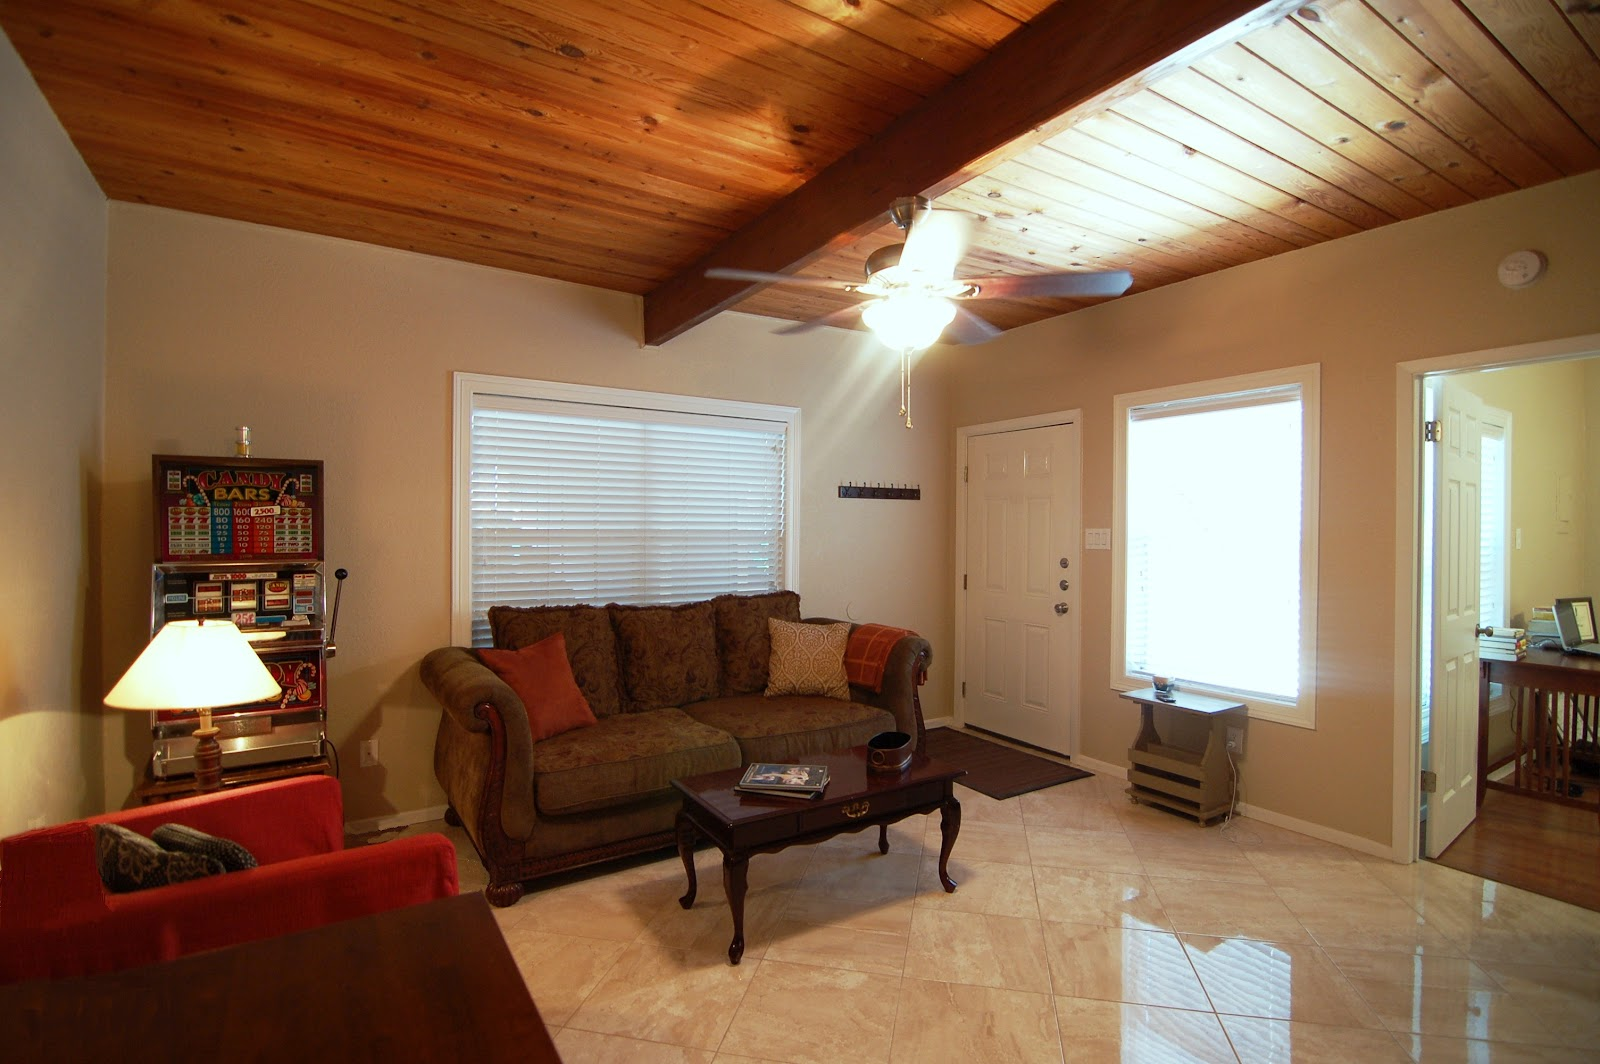 North Dallas Real Estate My Condo Remodel